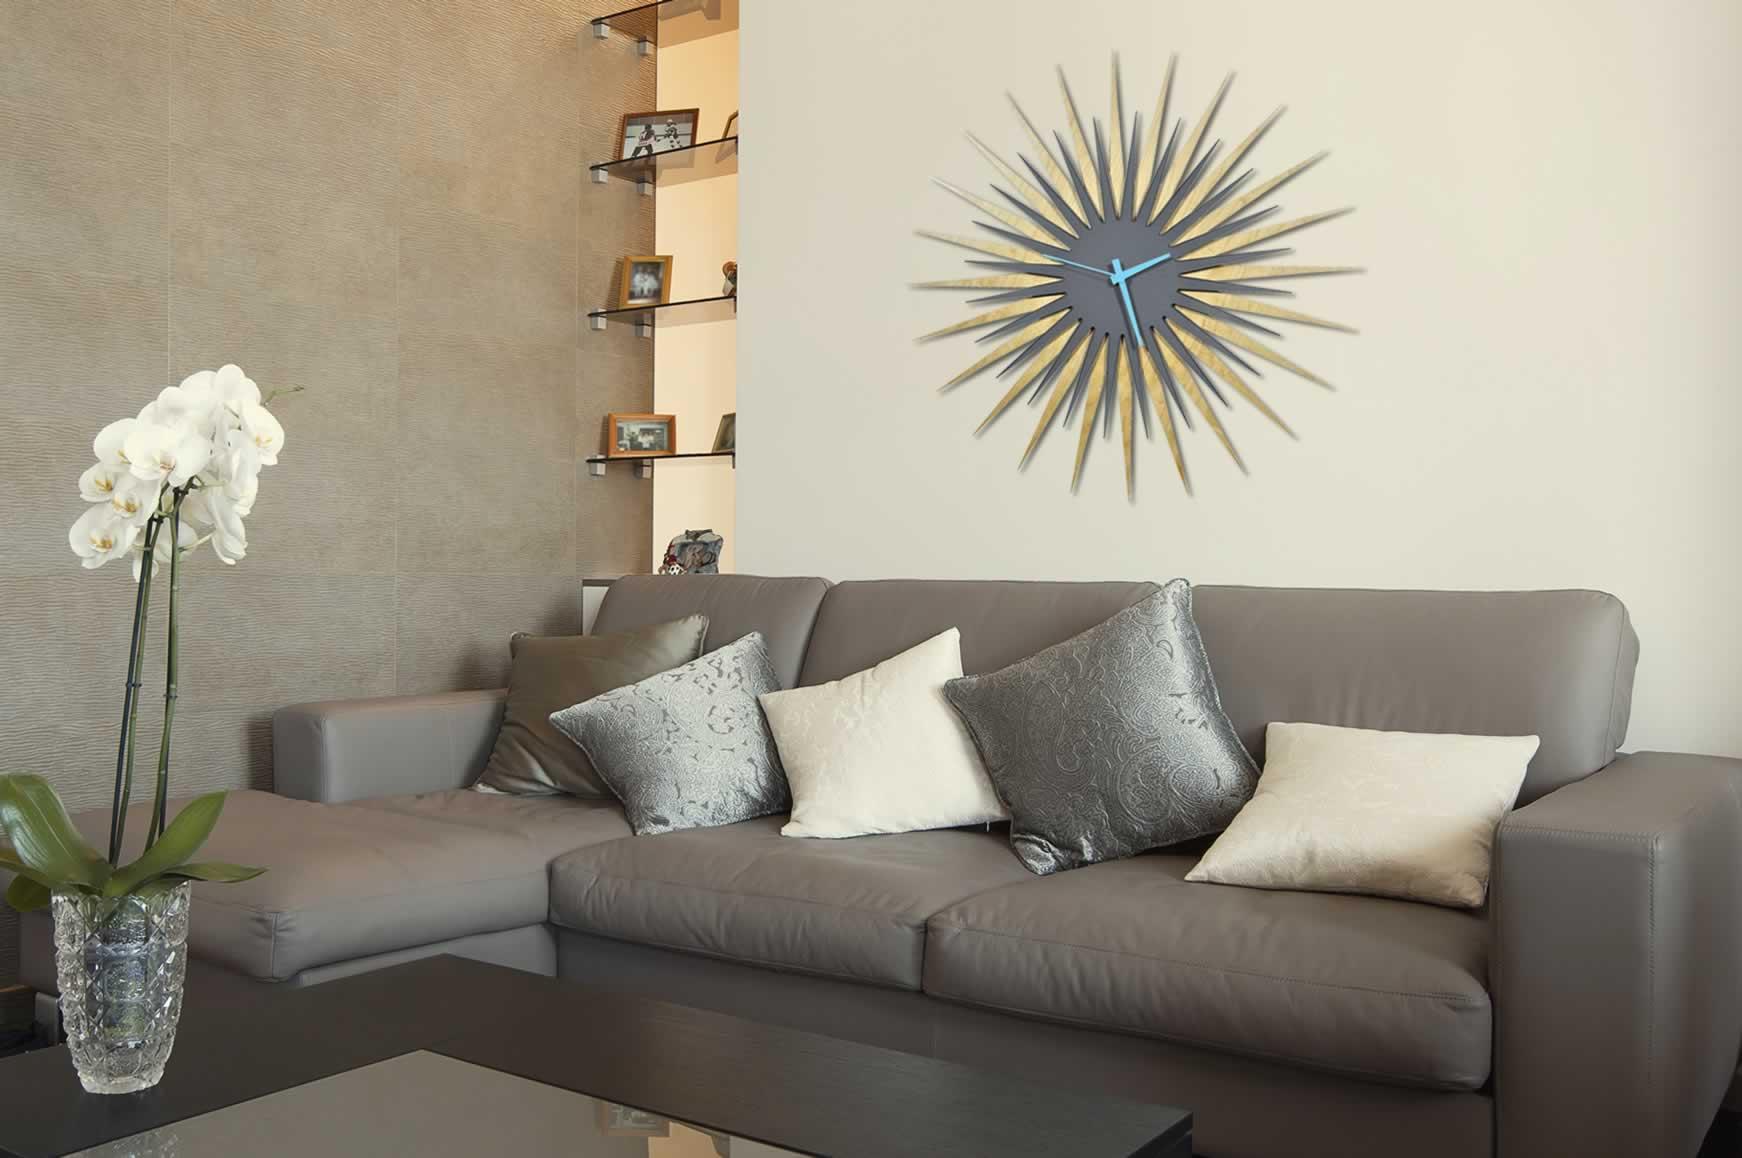 RF Atomic Clock - Maple Grey/Blue Starburst - Lifestyle Image